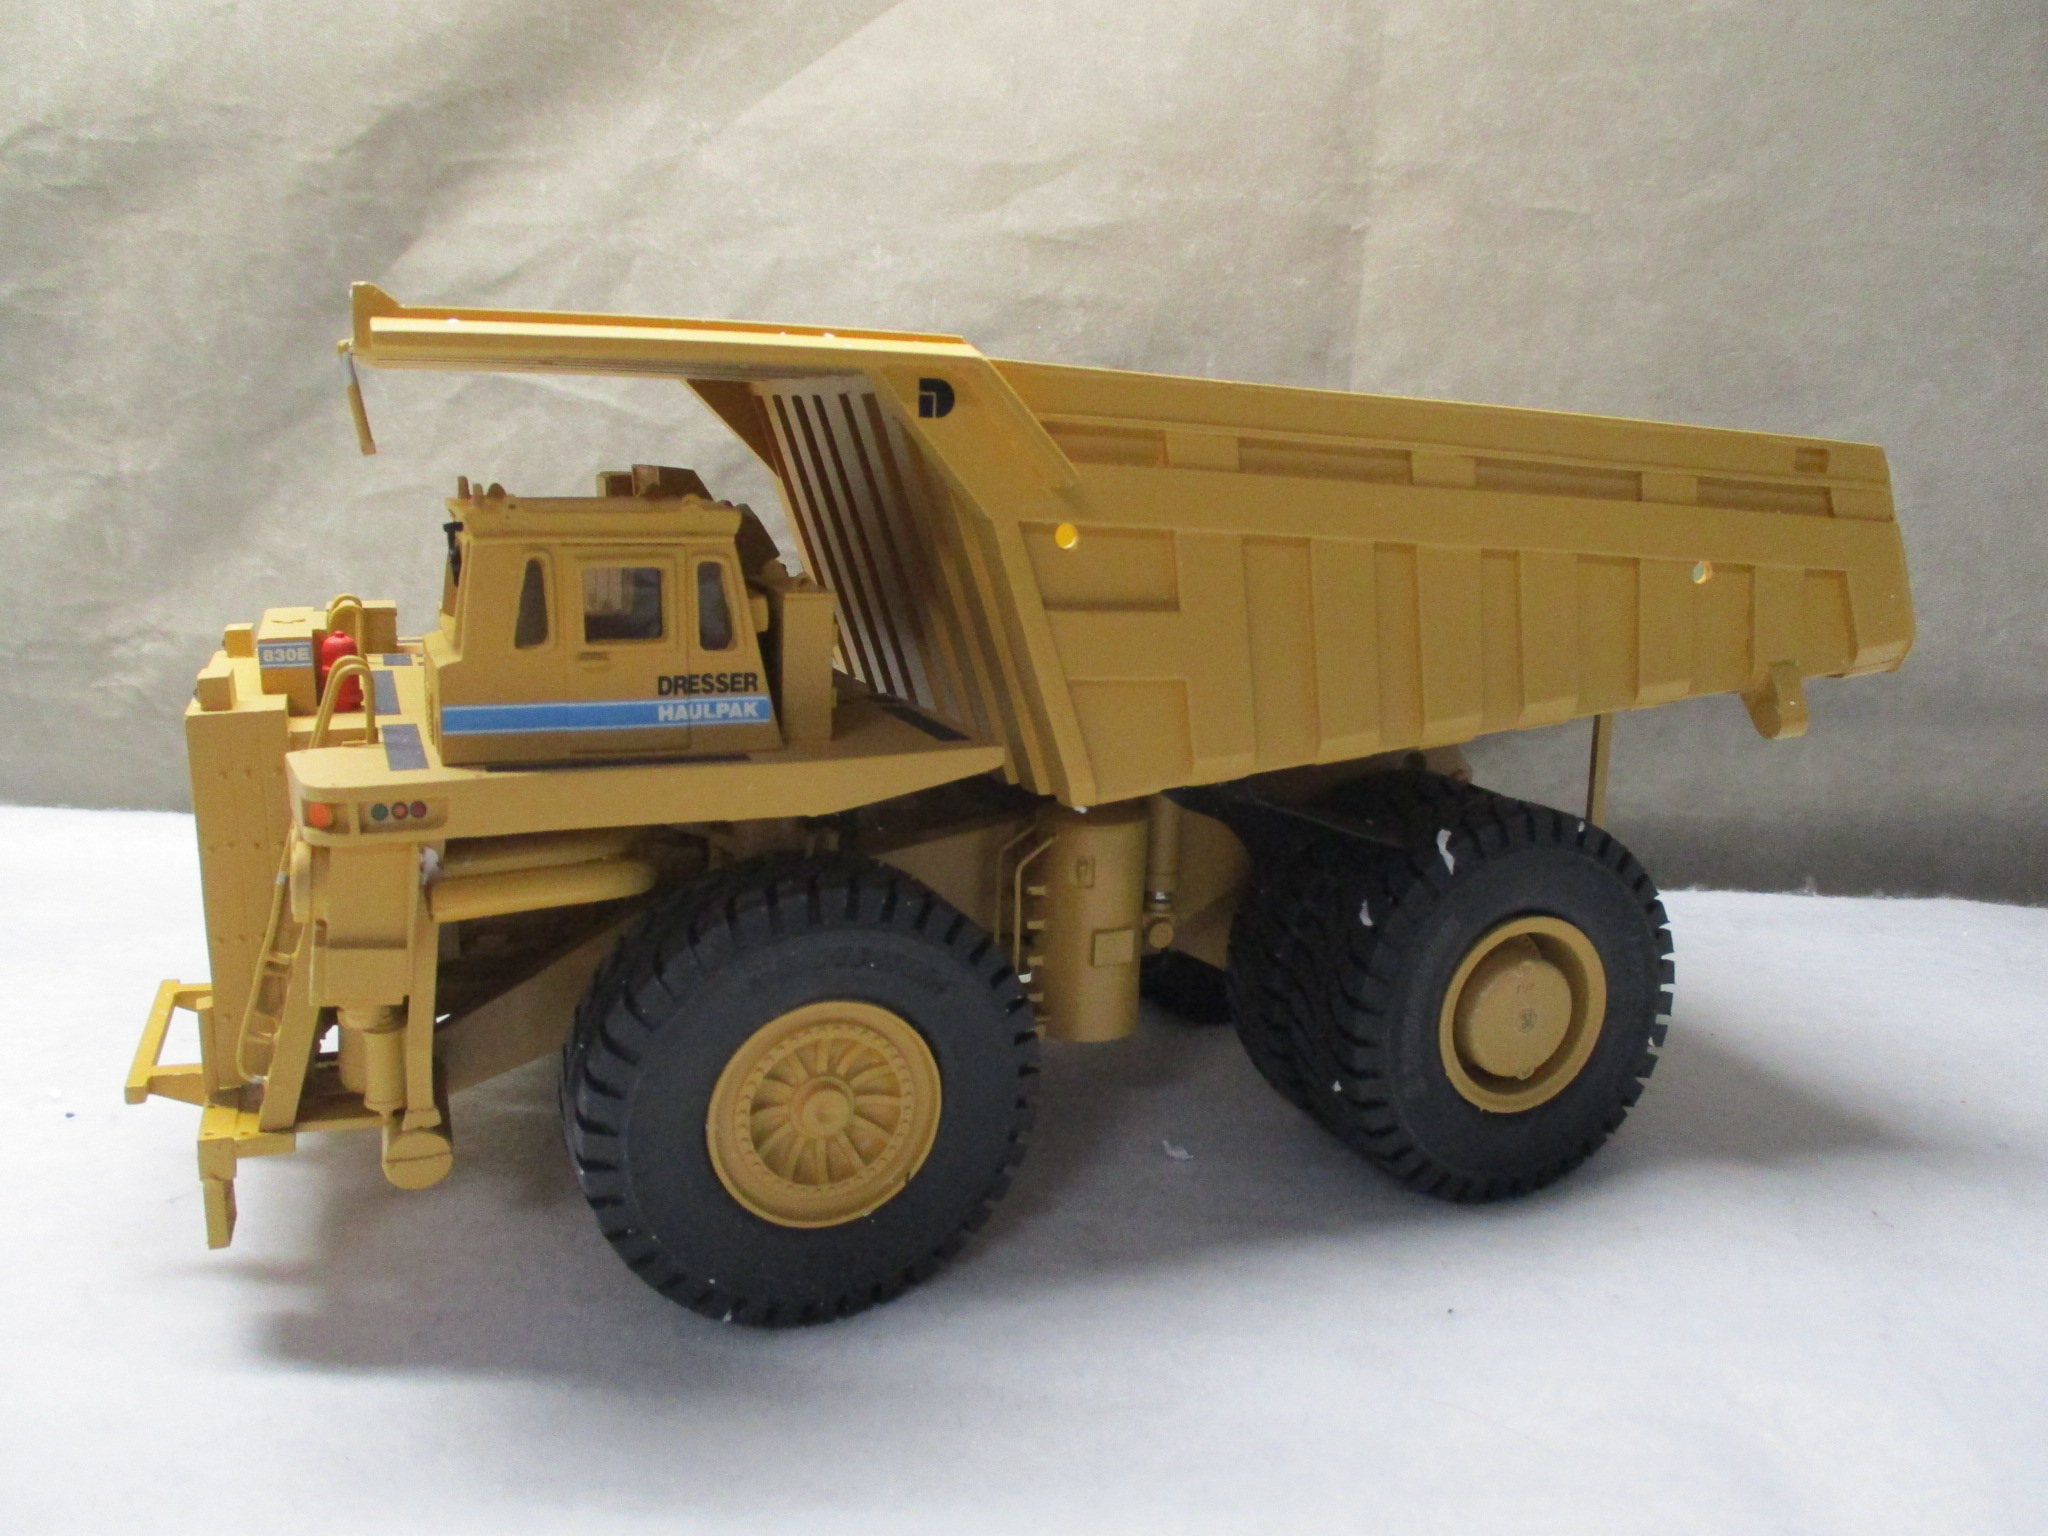 OHS Dresser 830E Mine Off Highway Dump Truck Updated 1/50 USED